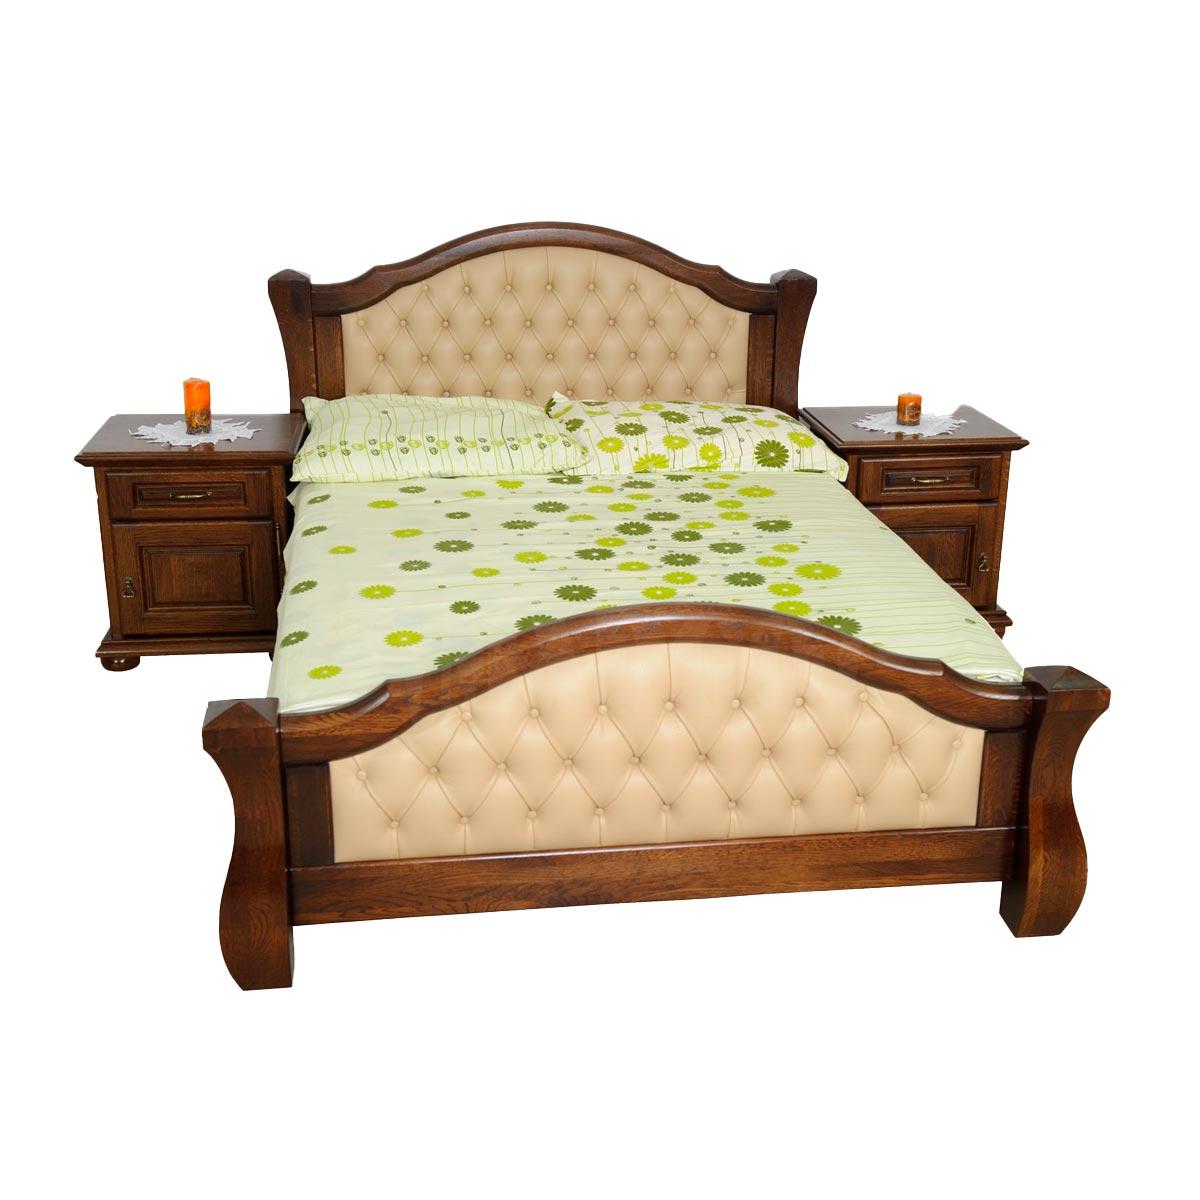 Dubová kožená postel Major 185 cm x 225 cm